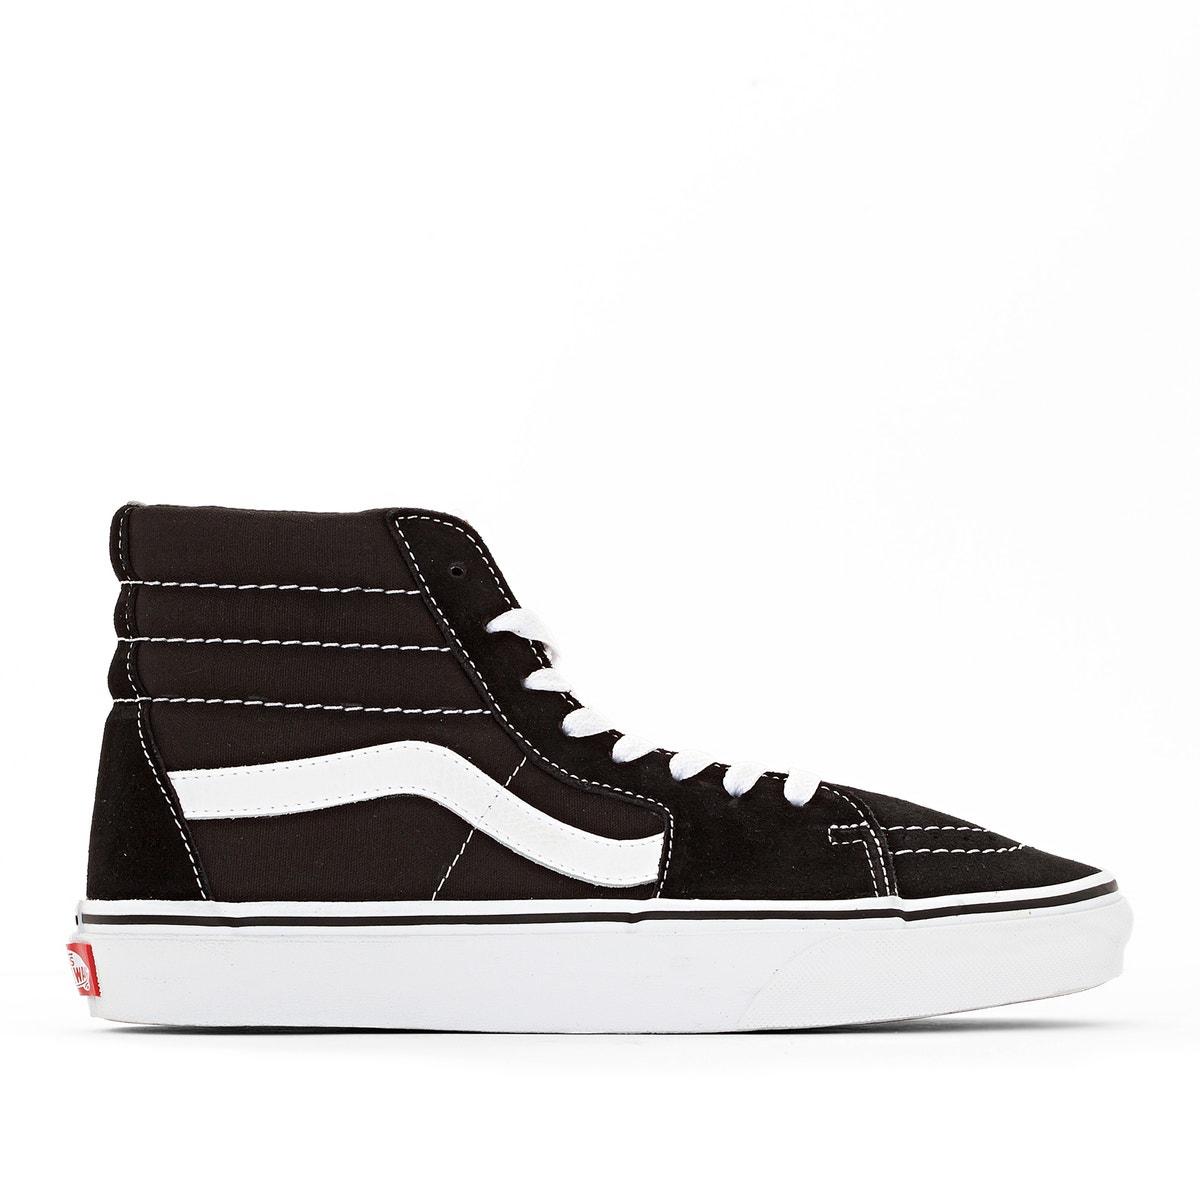 Vans - Vans K8-HI 350016466 - 6527 laredoute   ανδρικα   sneakers   mid cut